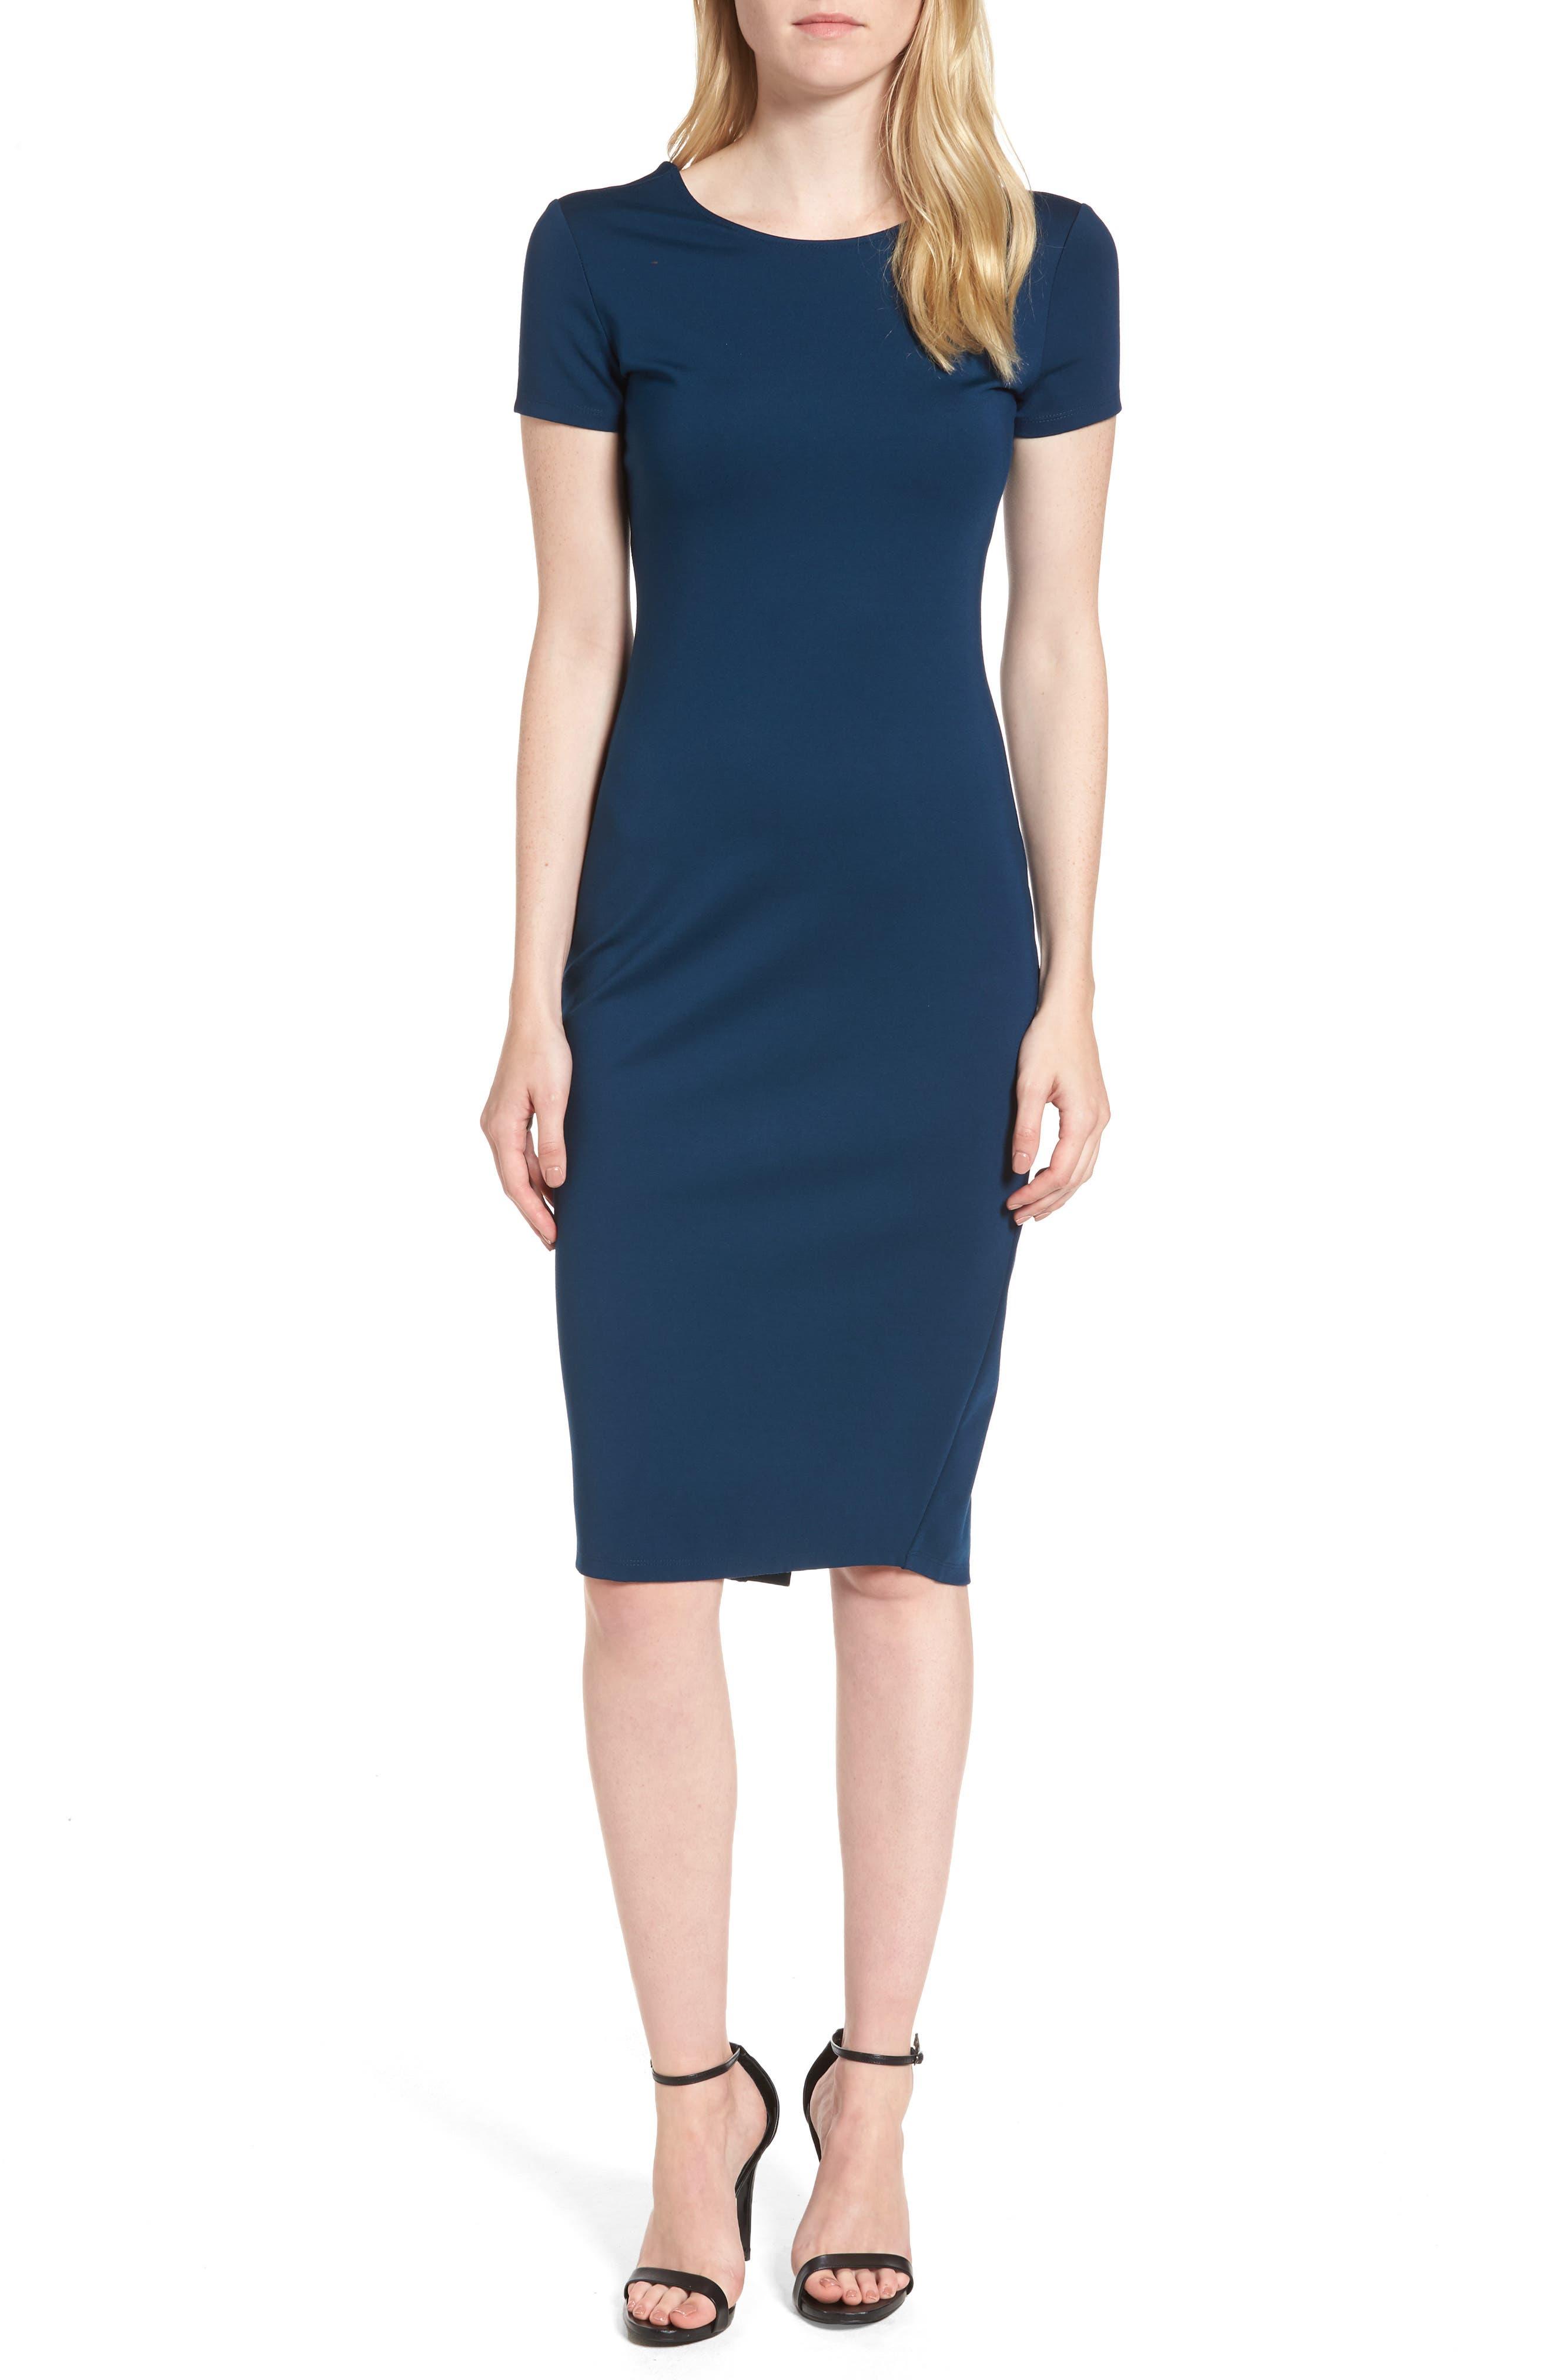 Women's Blue Sheath Dresses | Nordstrom